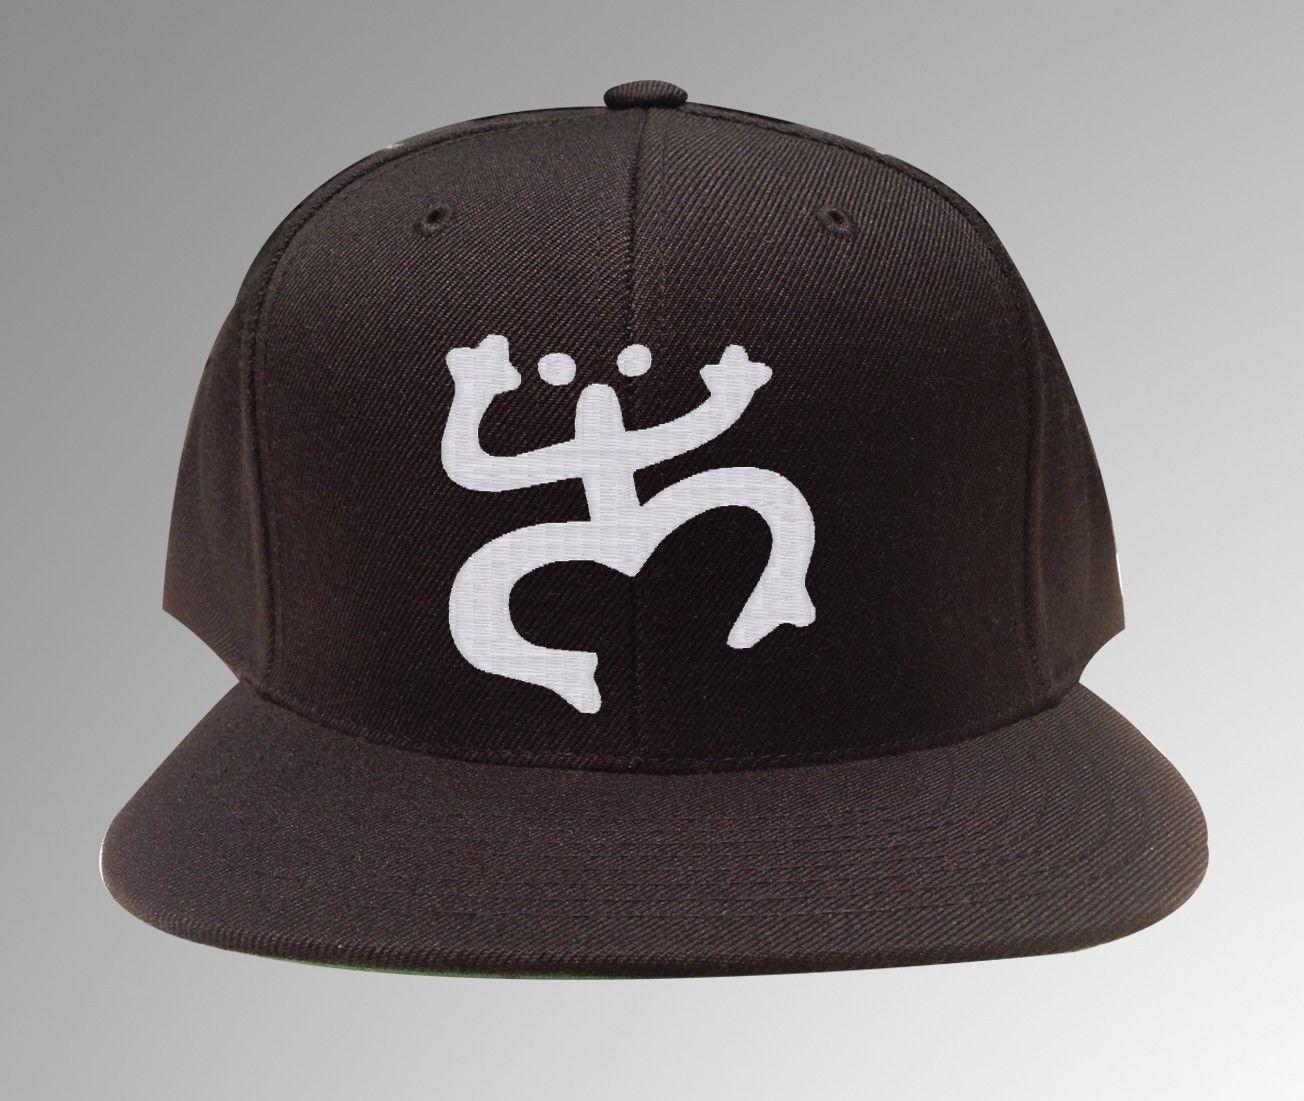 Taino Coqui Frog - Puerto Rican Symbol, Snapback Cap